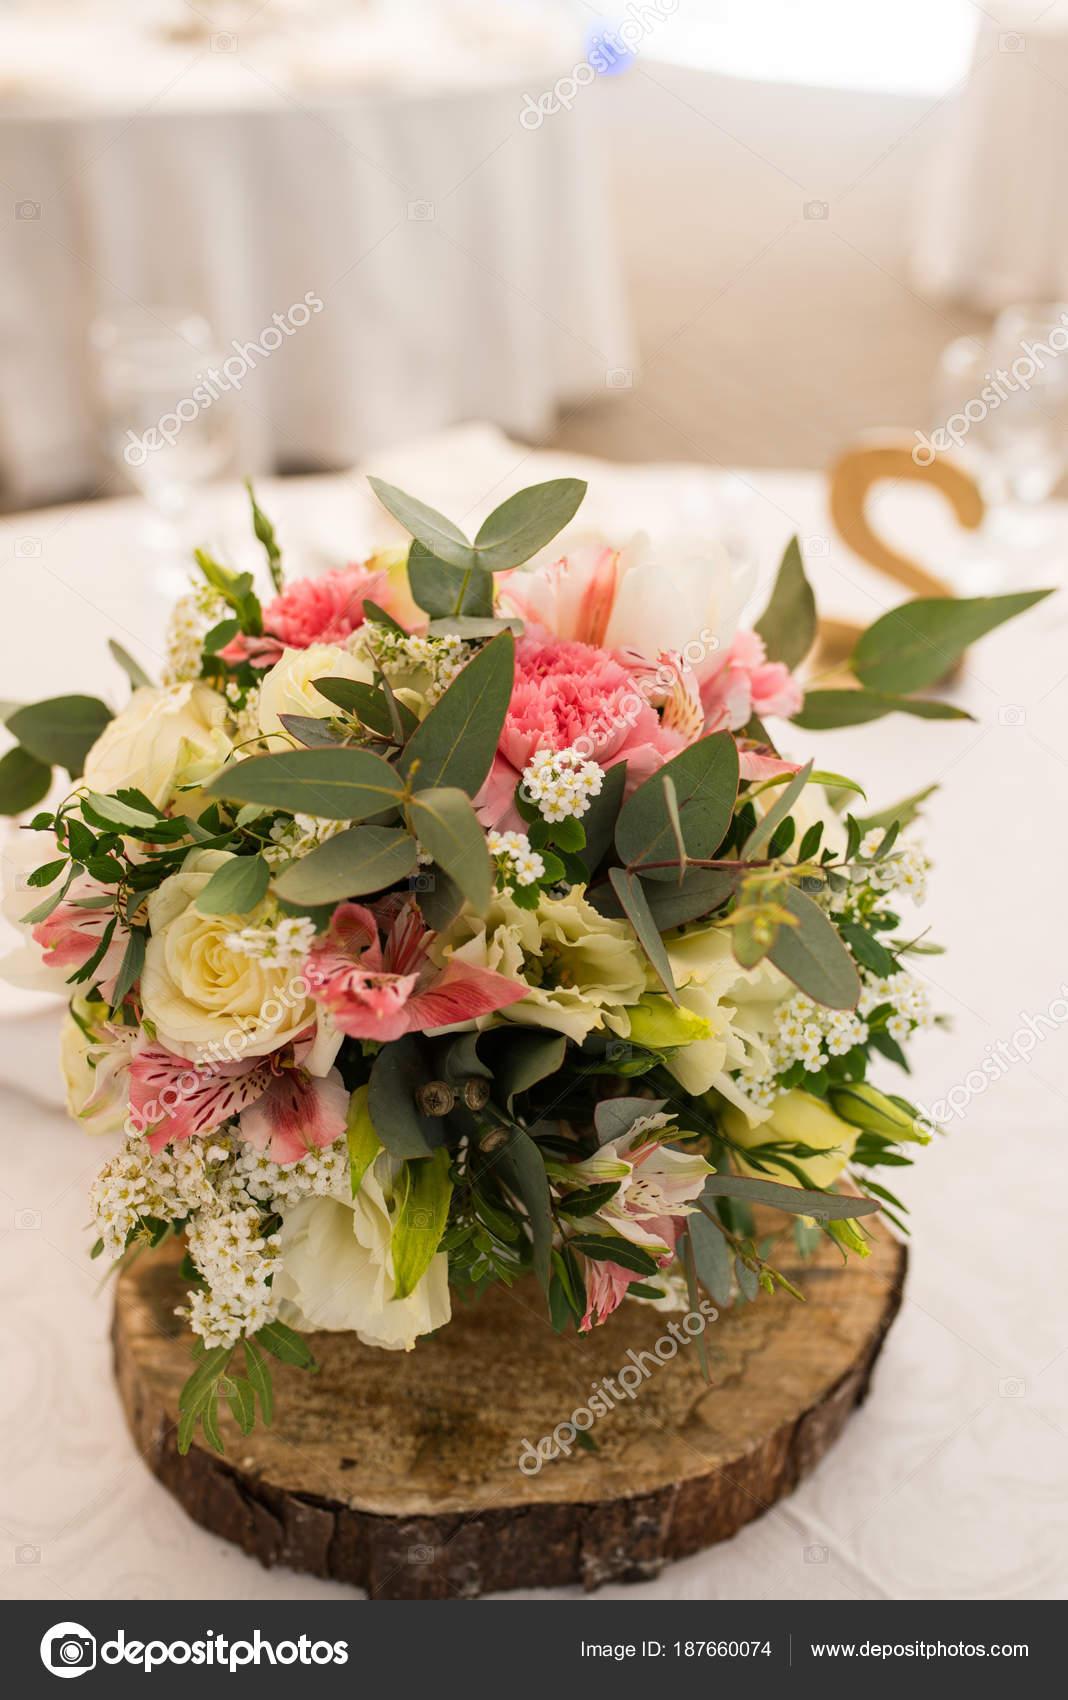 Rustic Flower Arrangement White Pink Flowers Wedding Banquet Table